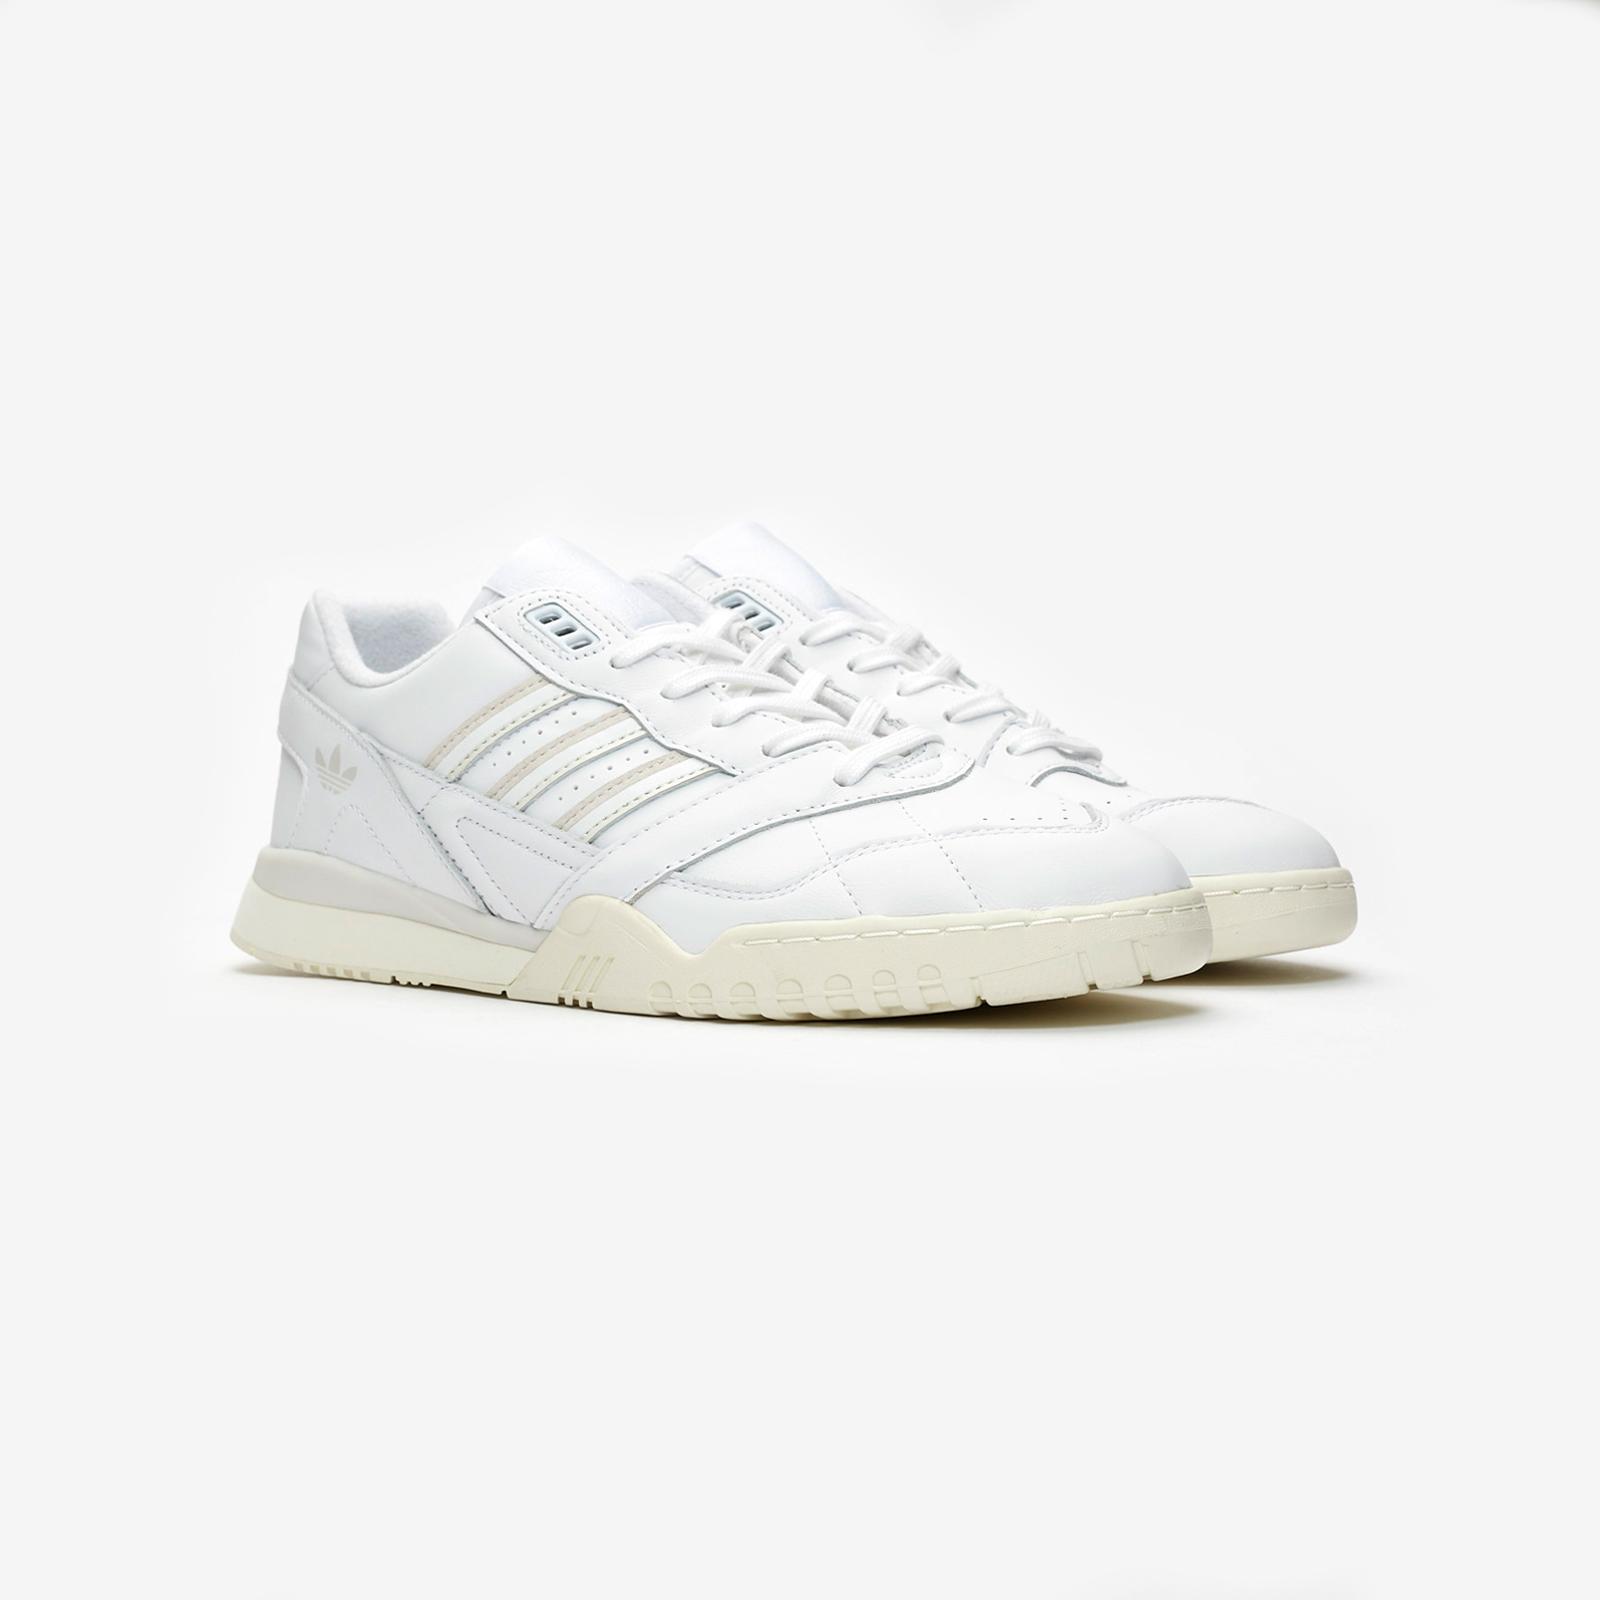 adidas A.R Trainer Cg6465 Sneakersnstuff | sneakers